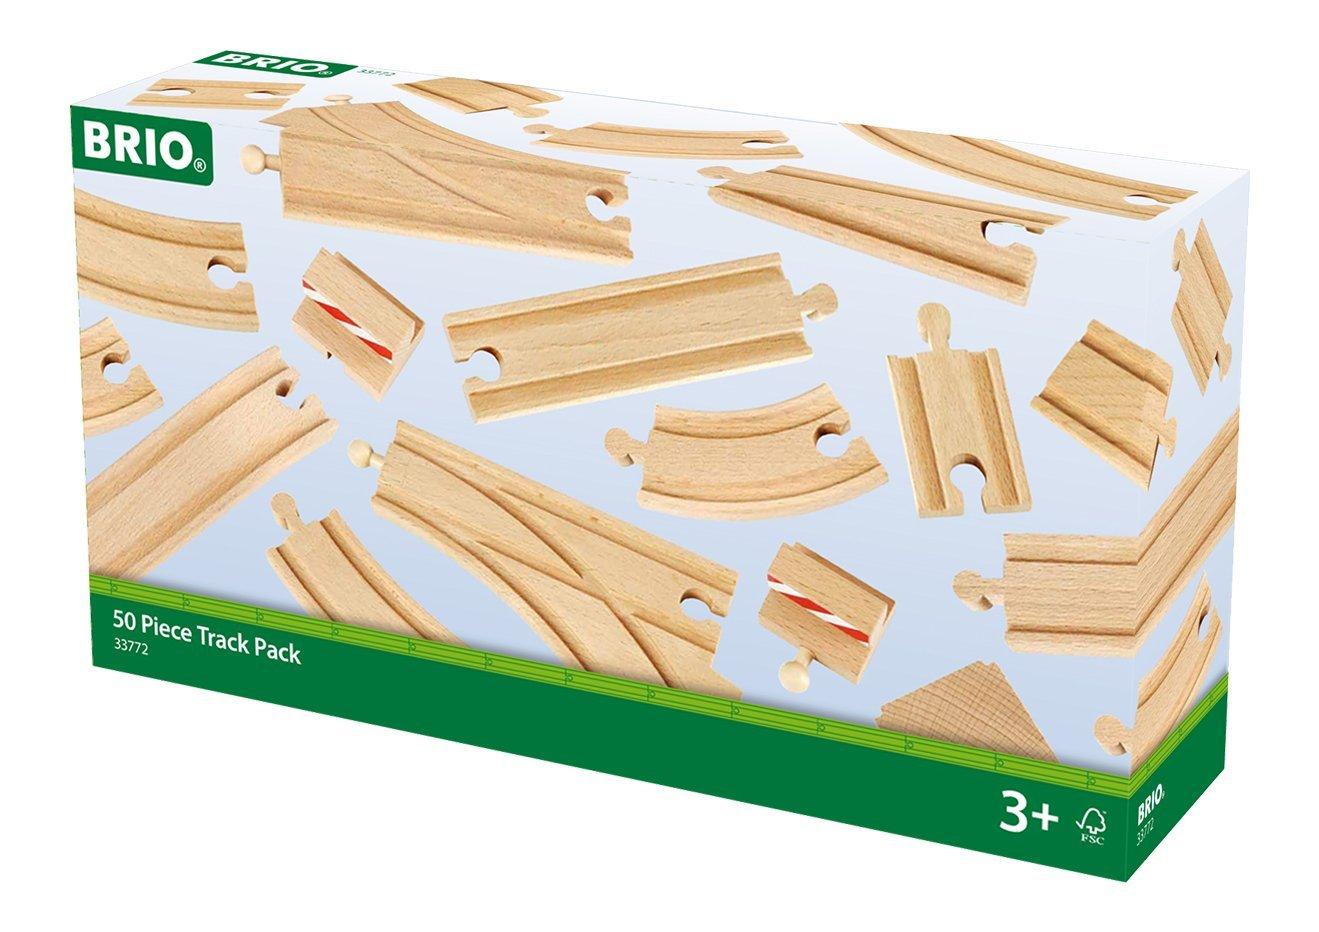 BRIO Railway Track Full Range Of Wooden Train Tracks